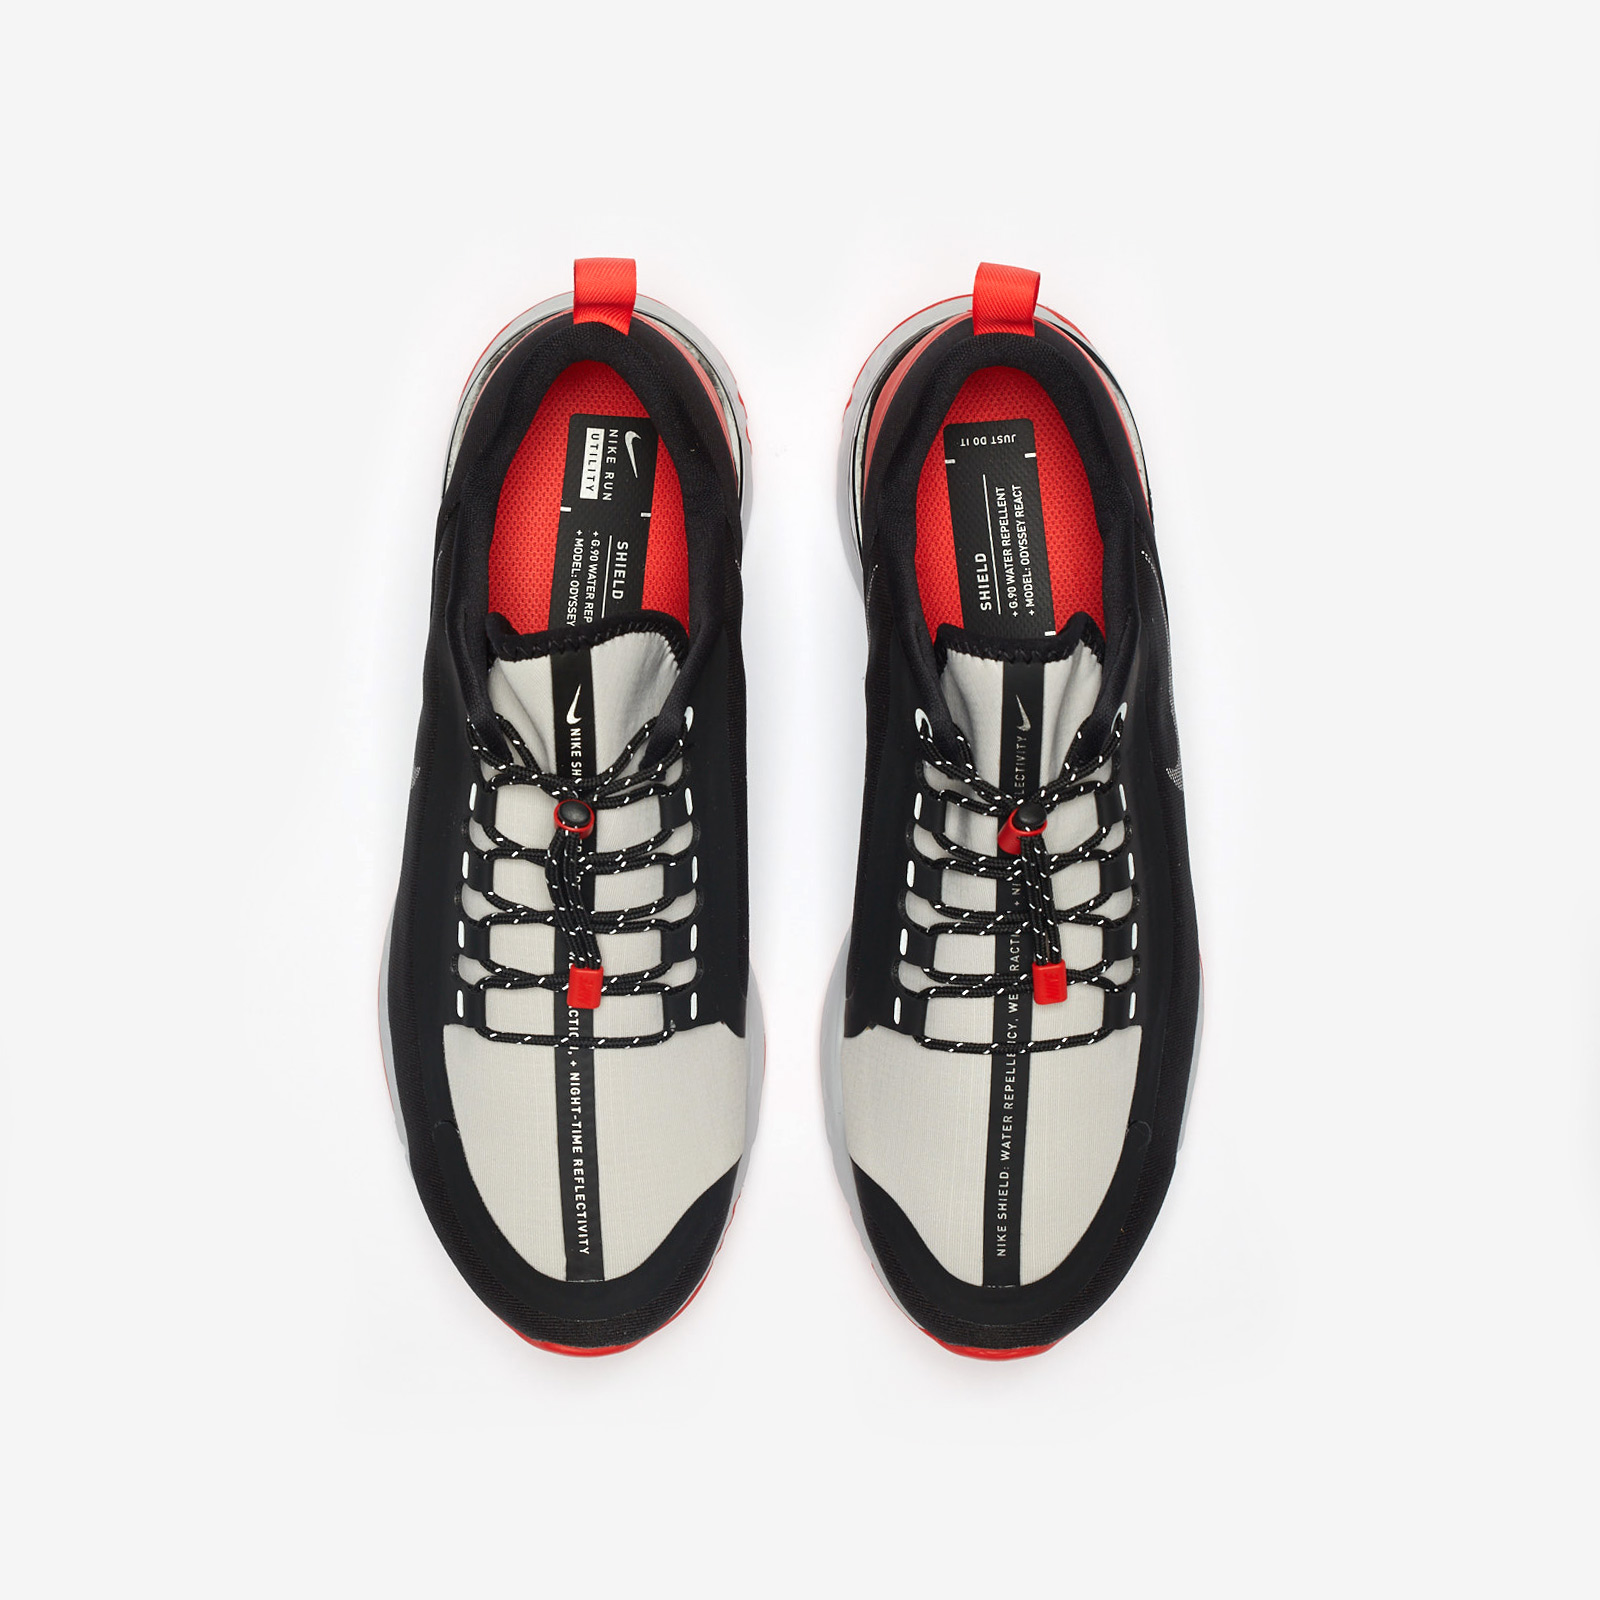 46b4eaa5d860 Nike Odyssey React Shield QS - Bq9780-006 - Sneakersnstuff ...